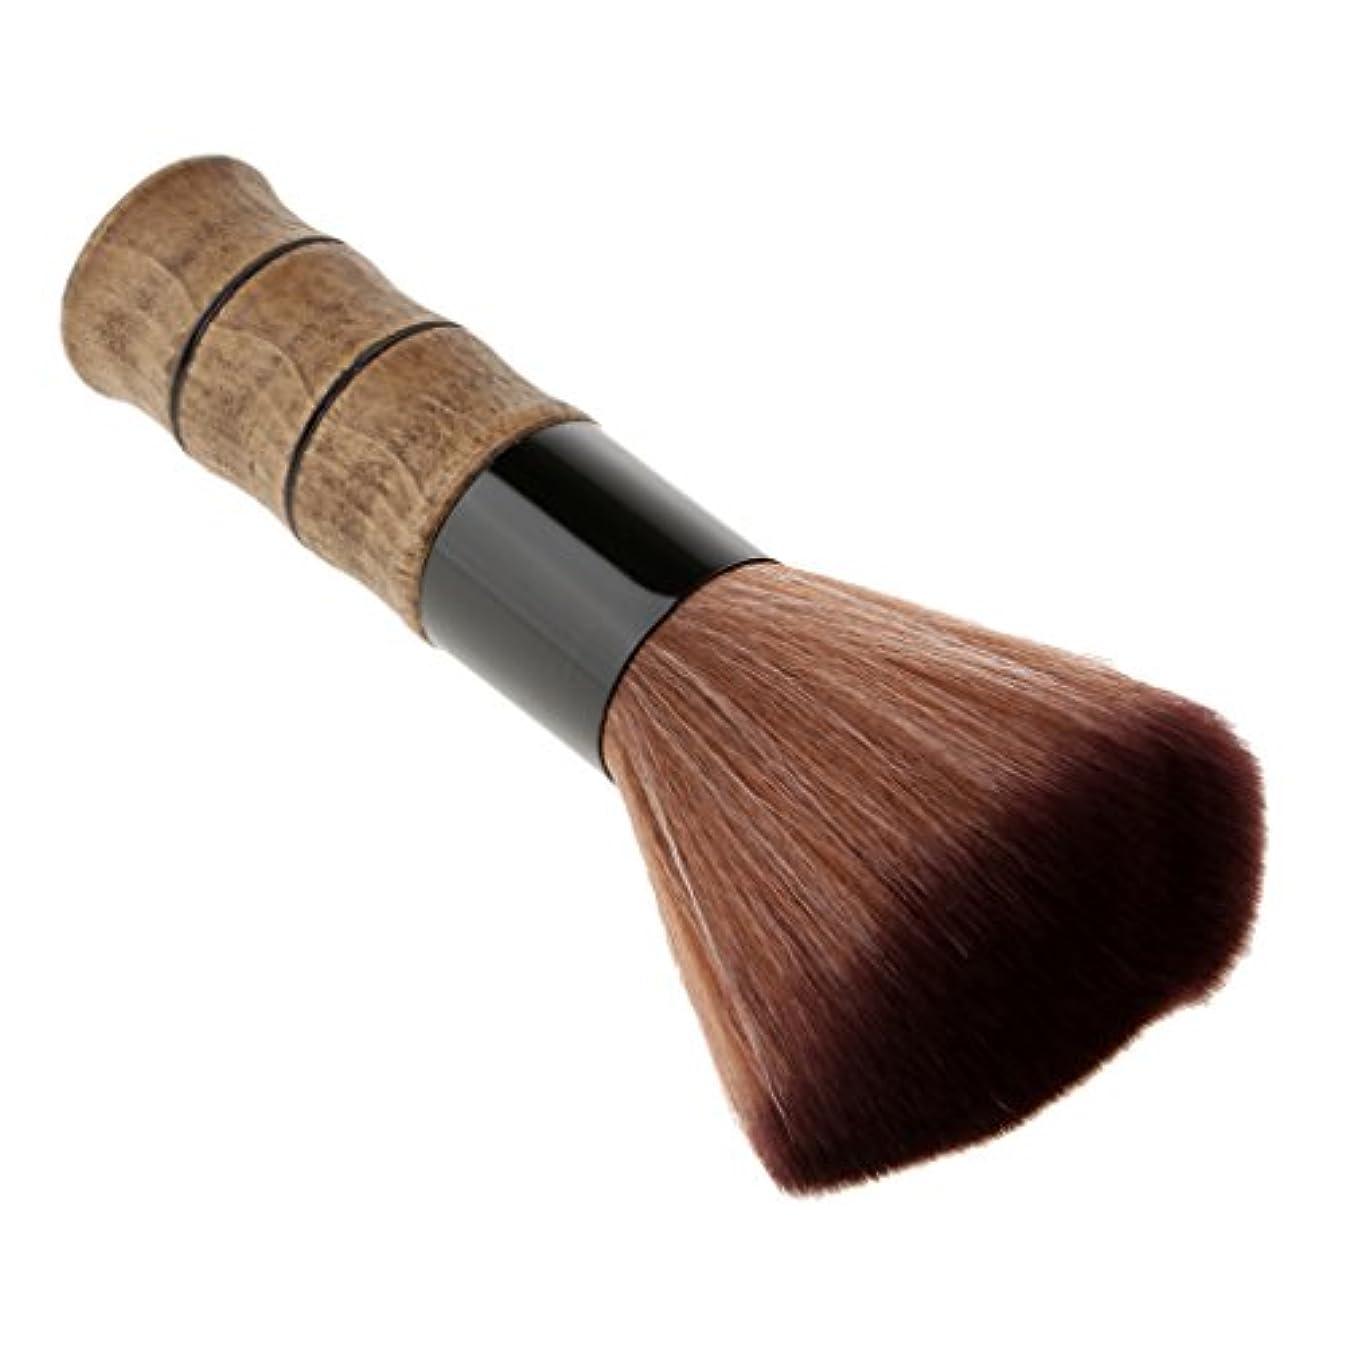 Blesiya シェービングブラシ 洗顔 化粧ブラシ メイクブラシ ソフトファイバー ブラシ スキンケア メイクアップ 高品質 2色選べる - 褐色